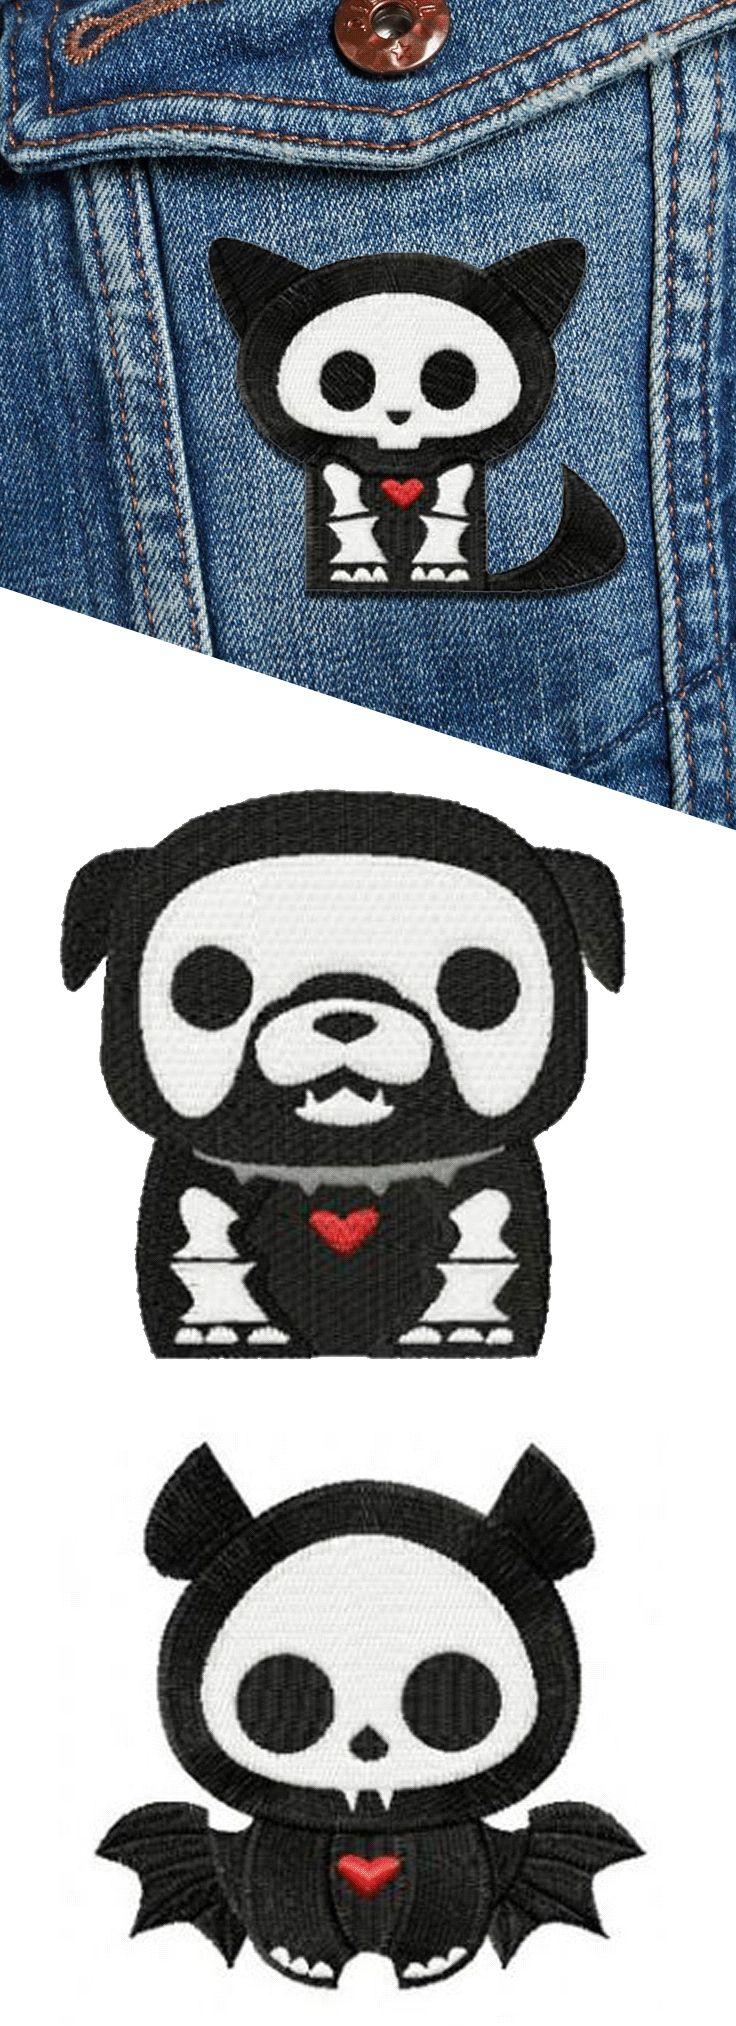 Shop creepy cute Skelanimals custom patches at RebelsMarket!